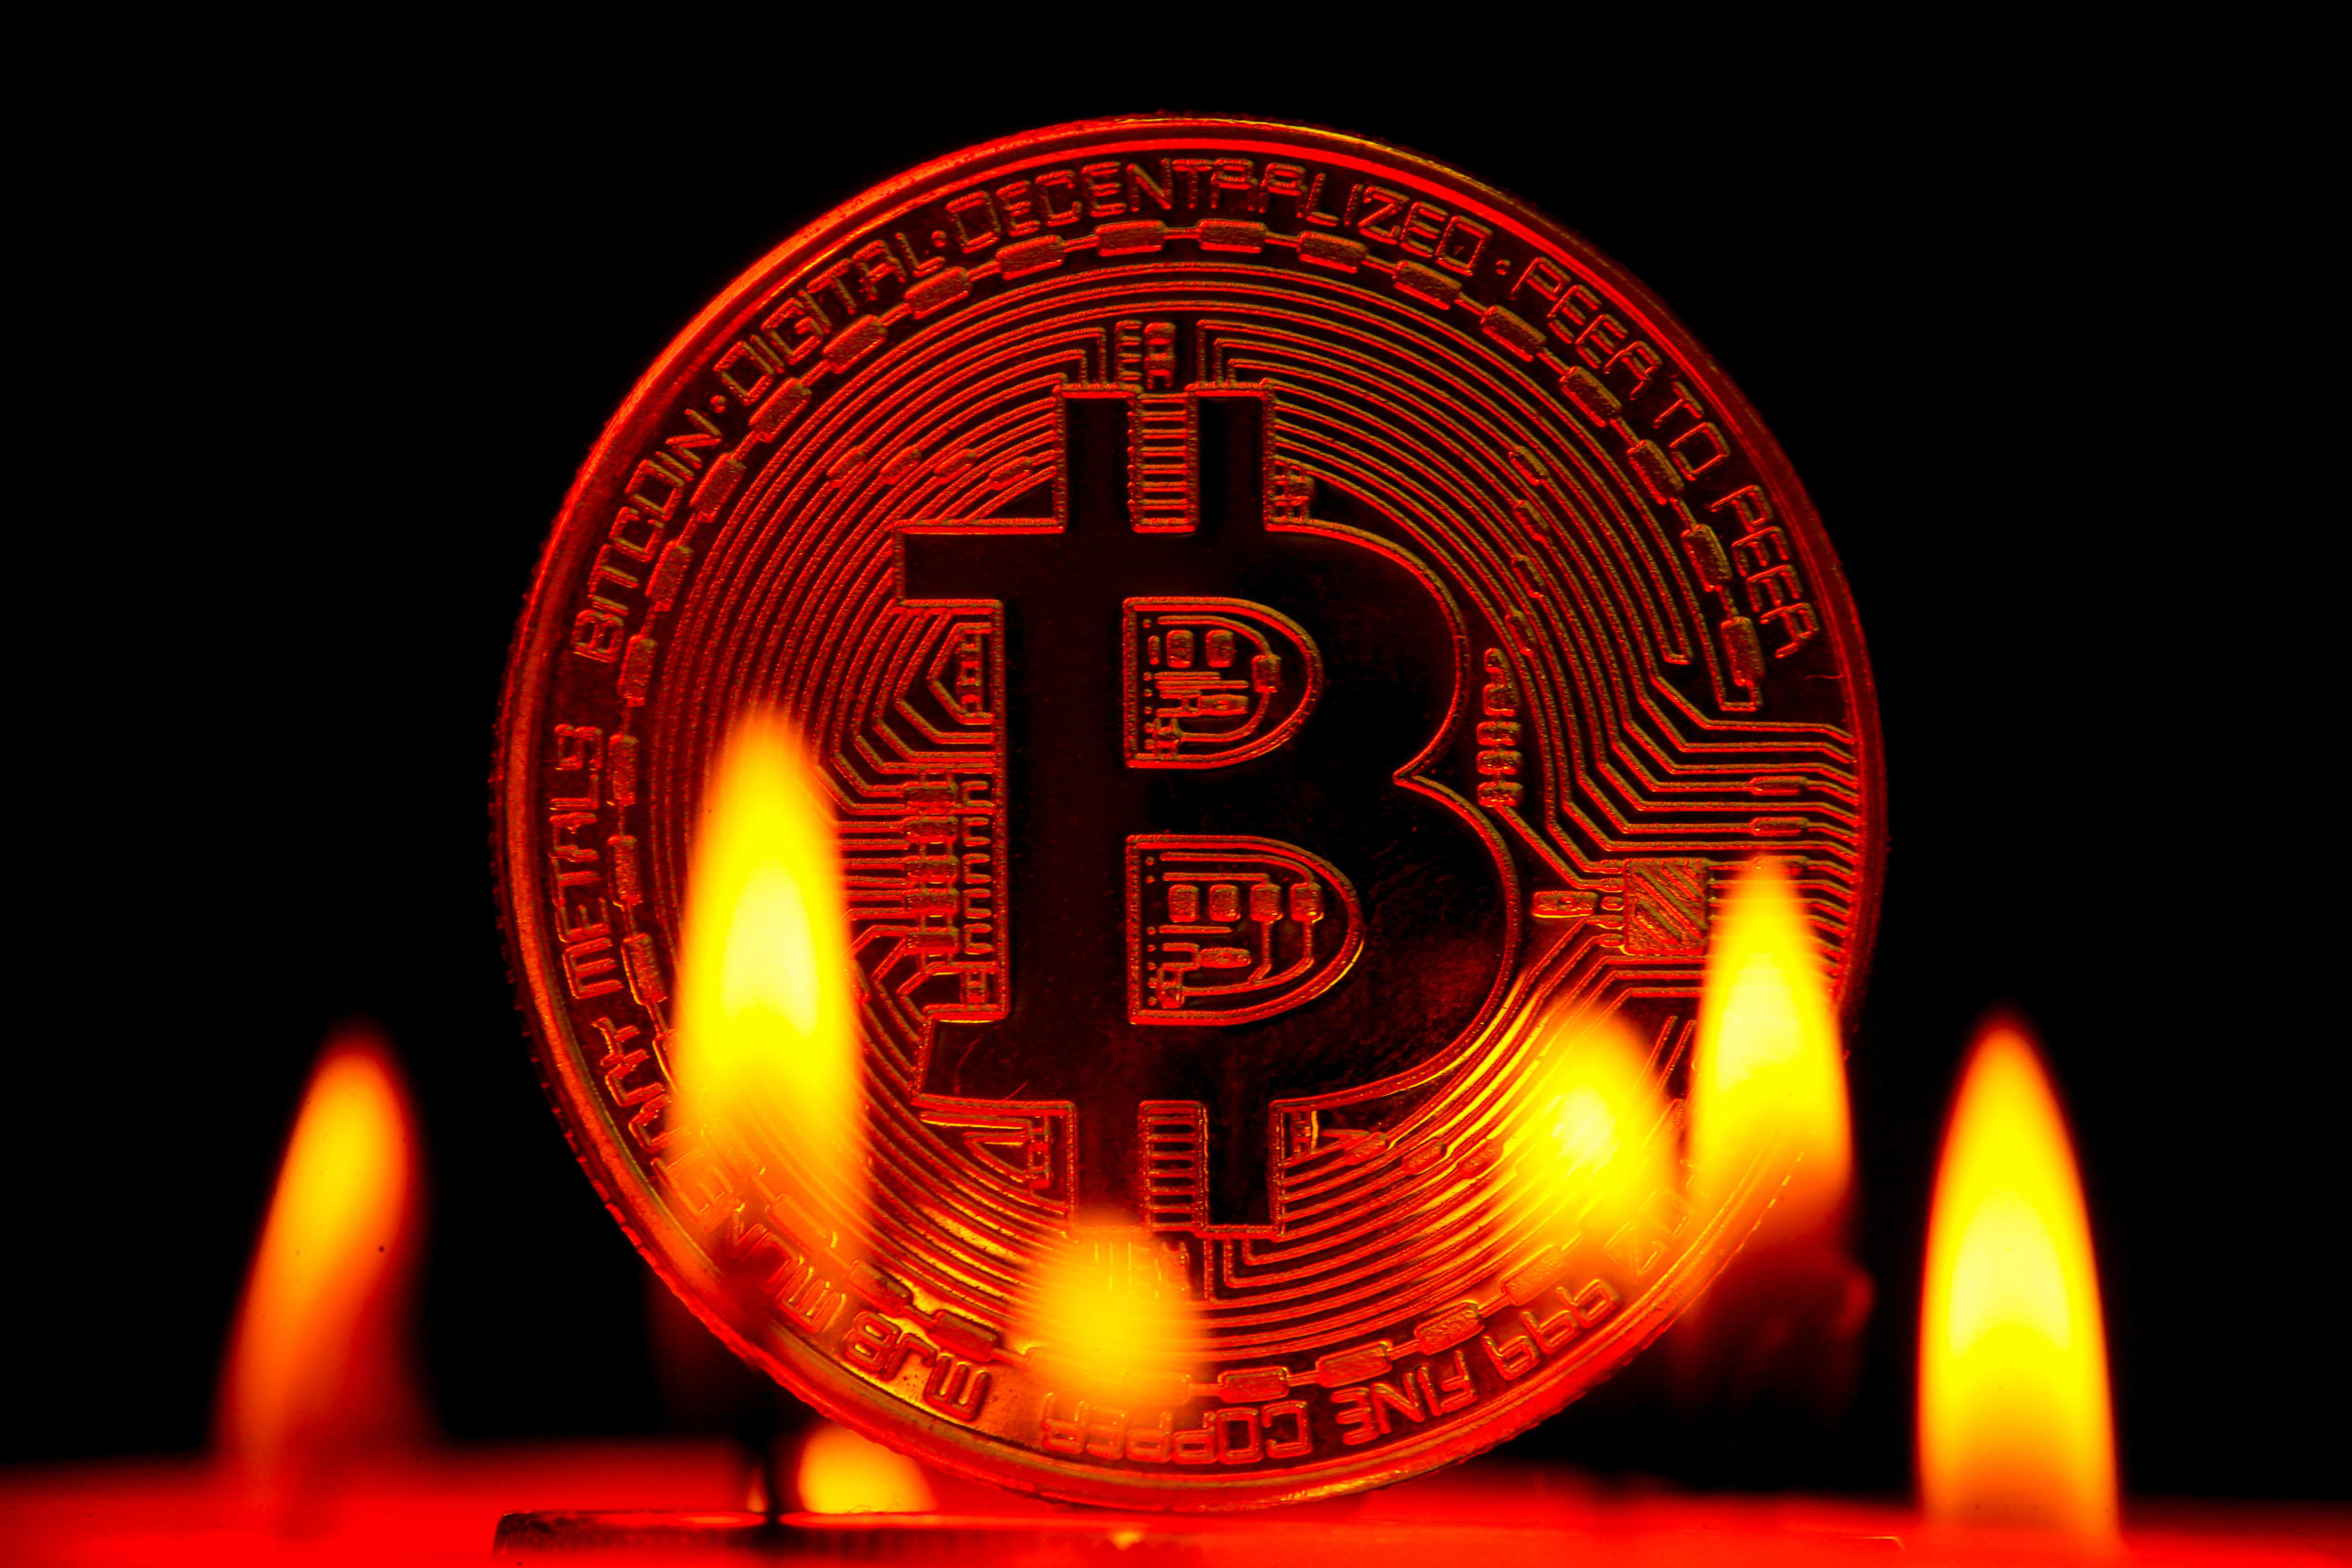 bitcoin btc 30 000 dolari gordu analistler guncel durumu yorumladi